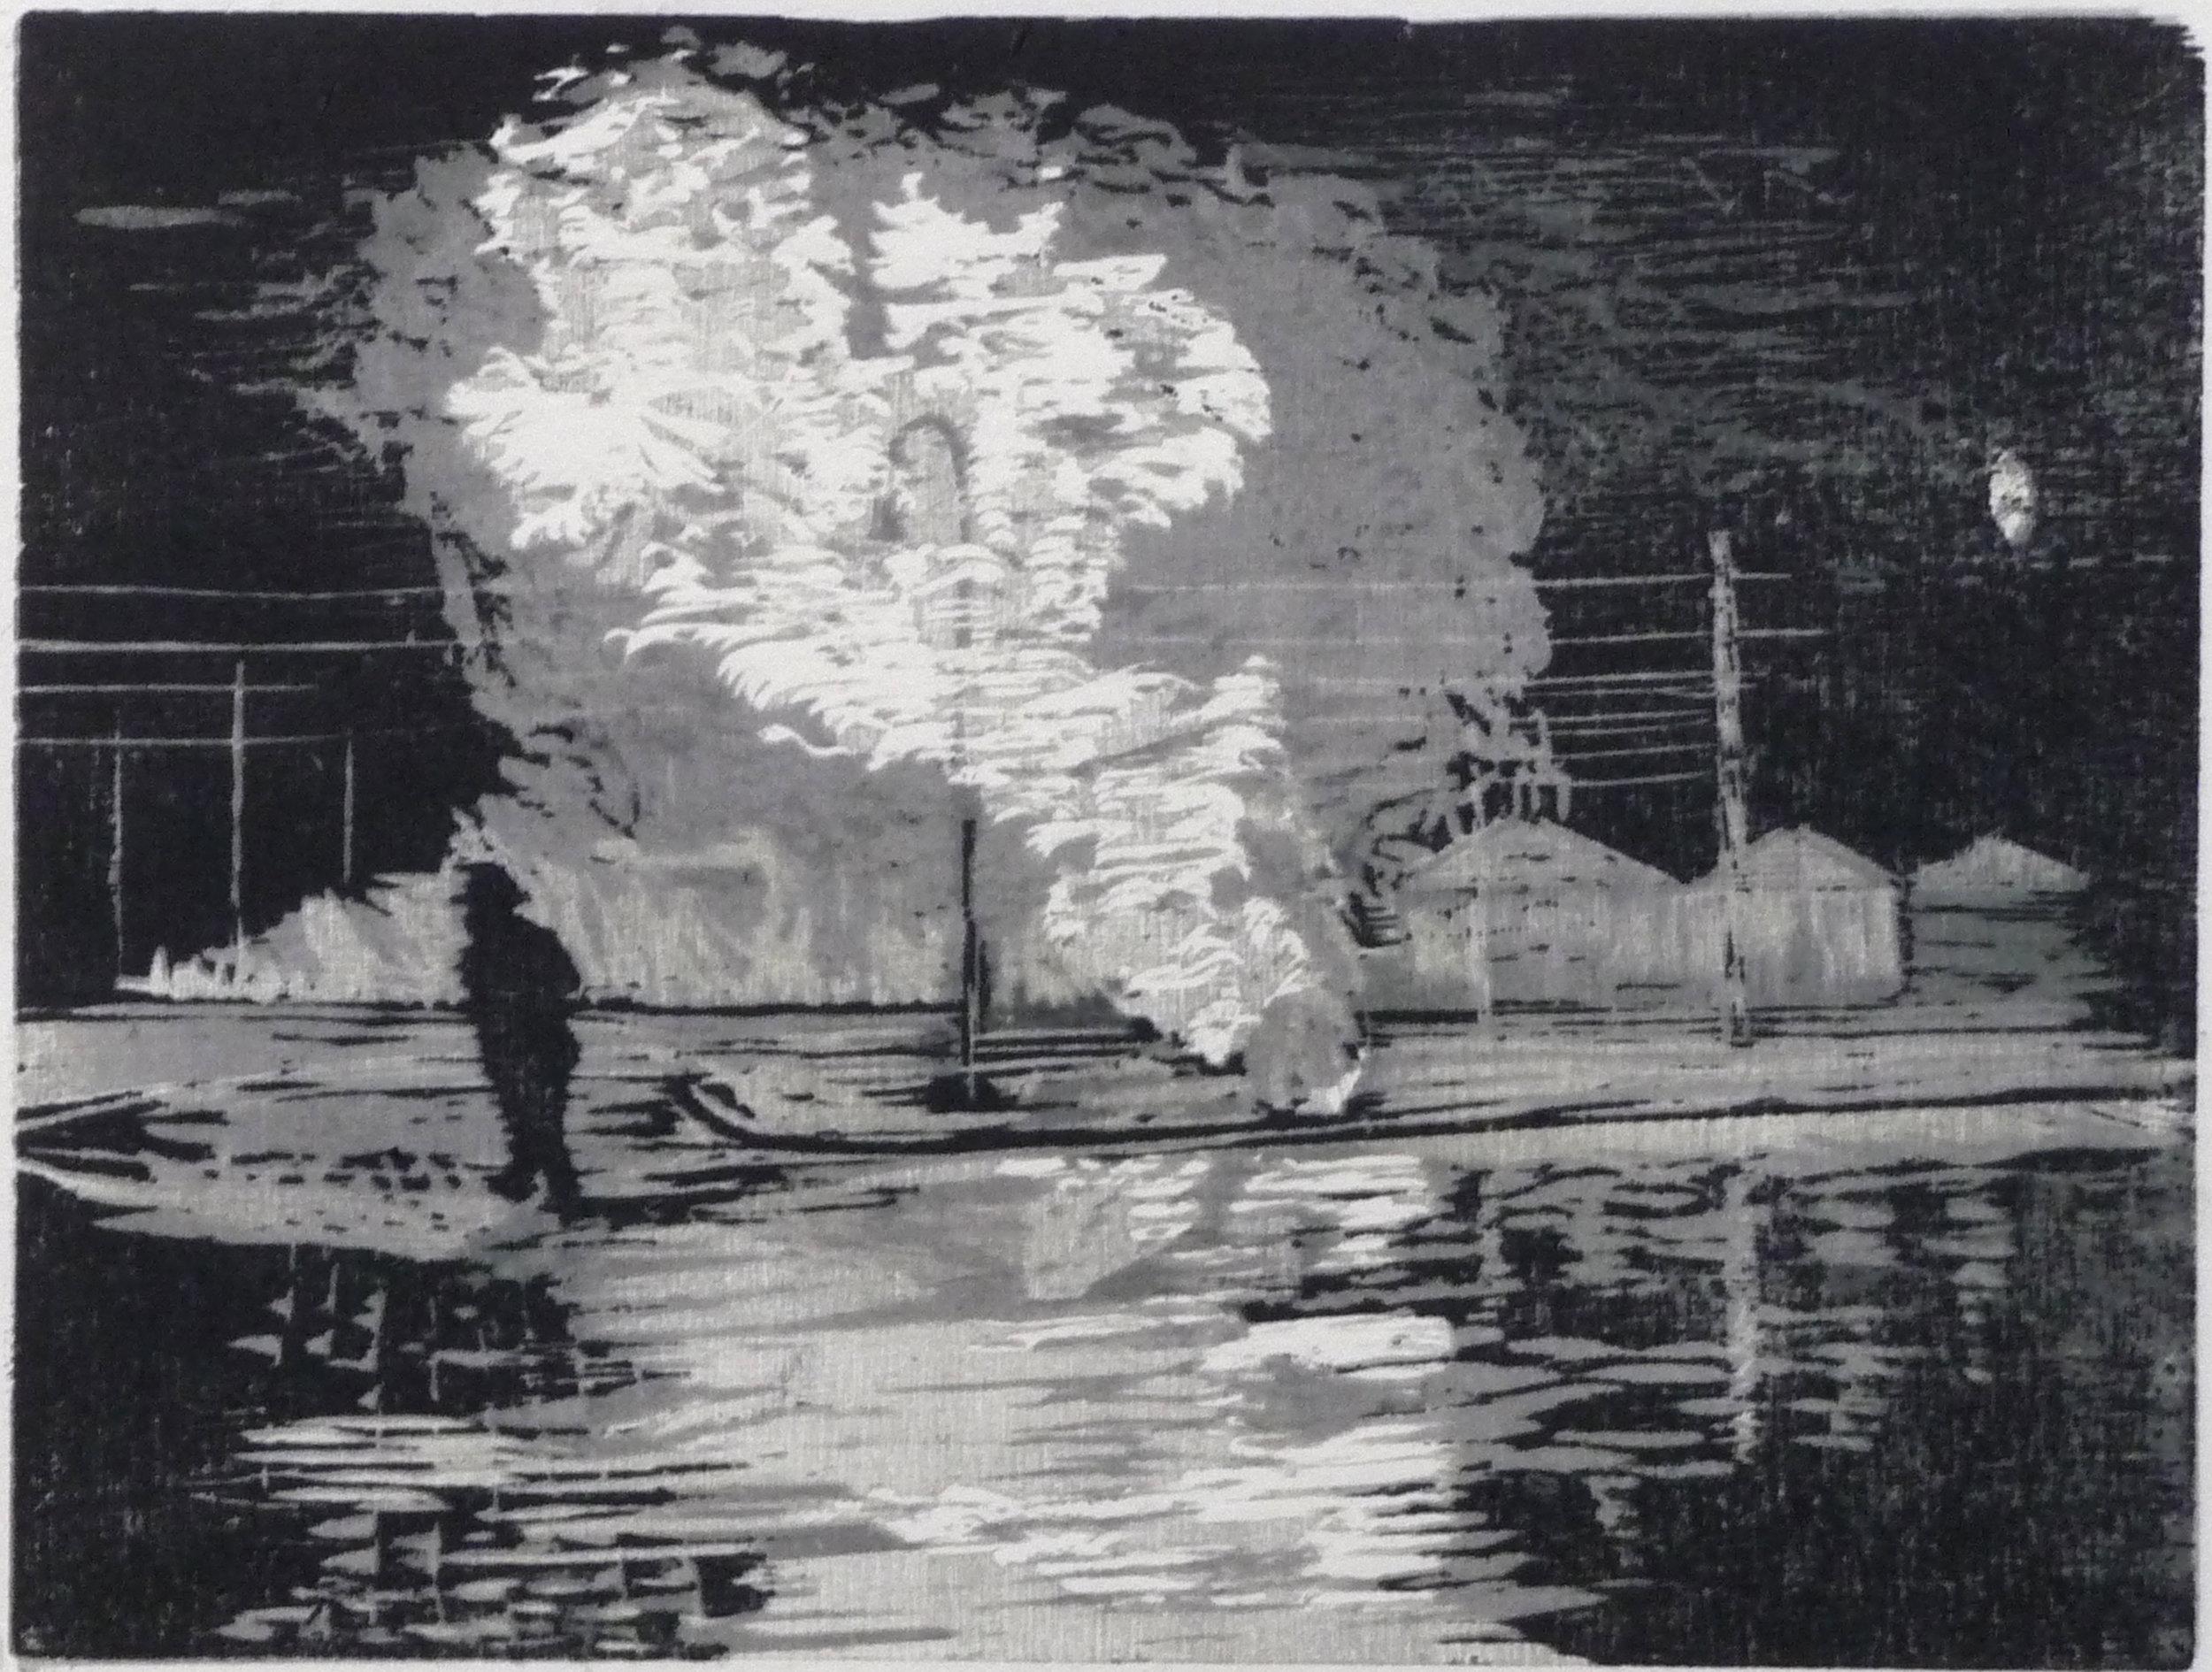 Licht, woodcut, 32 x 44 cm, 2014